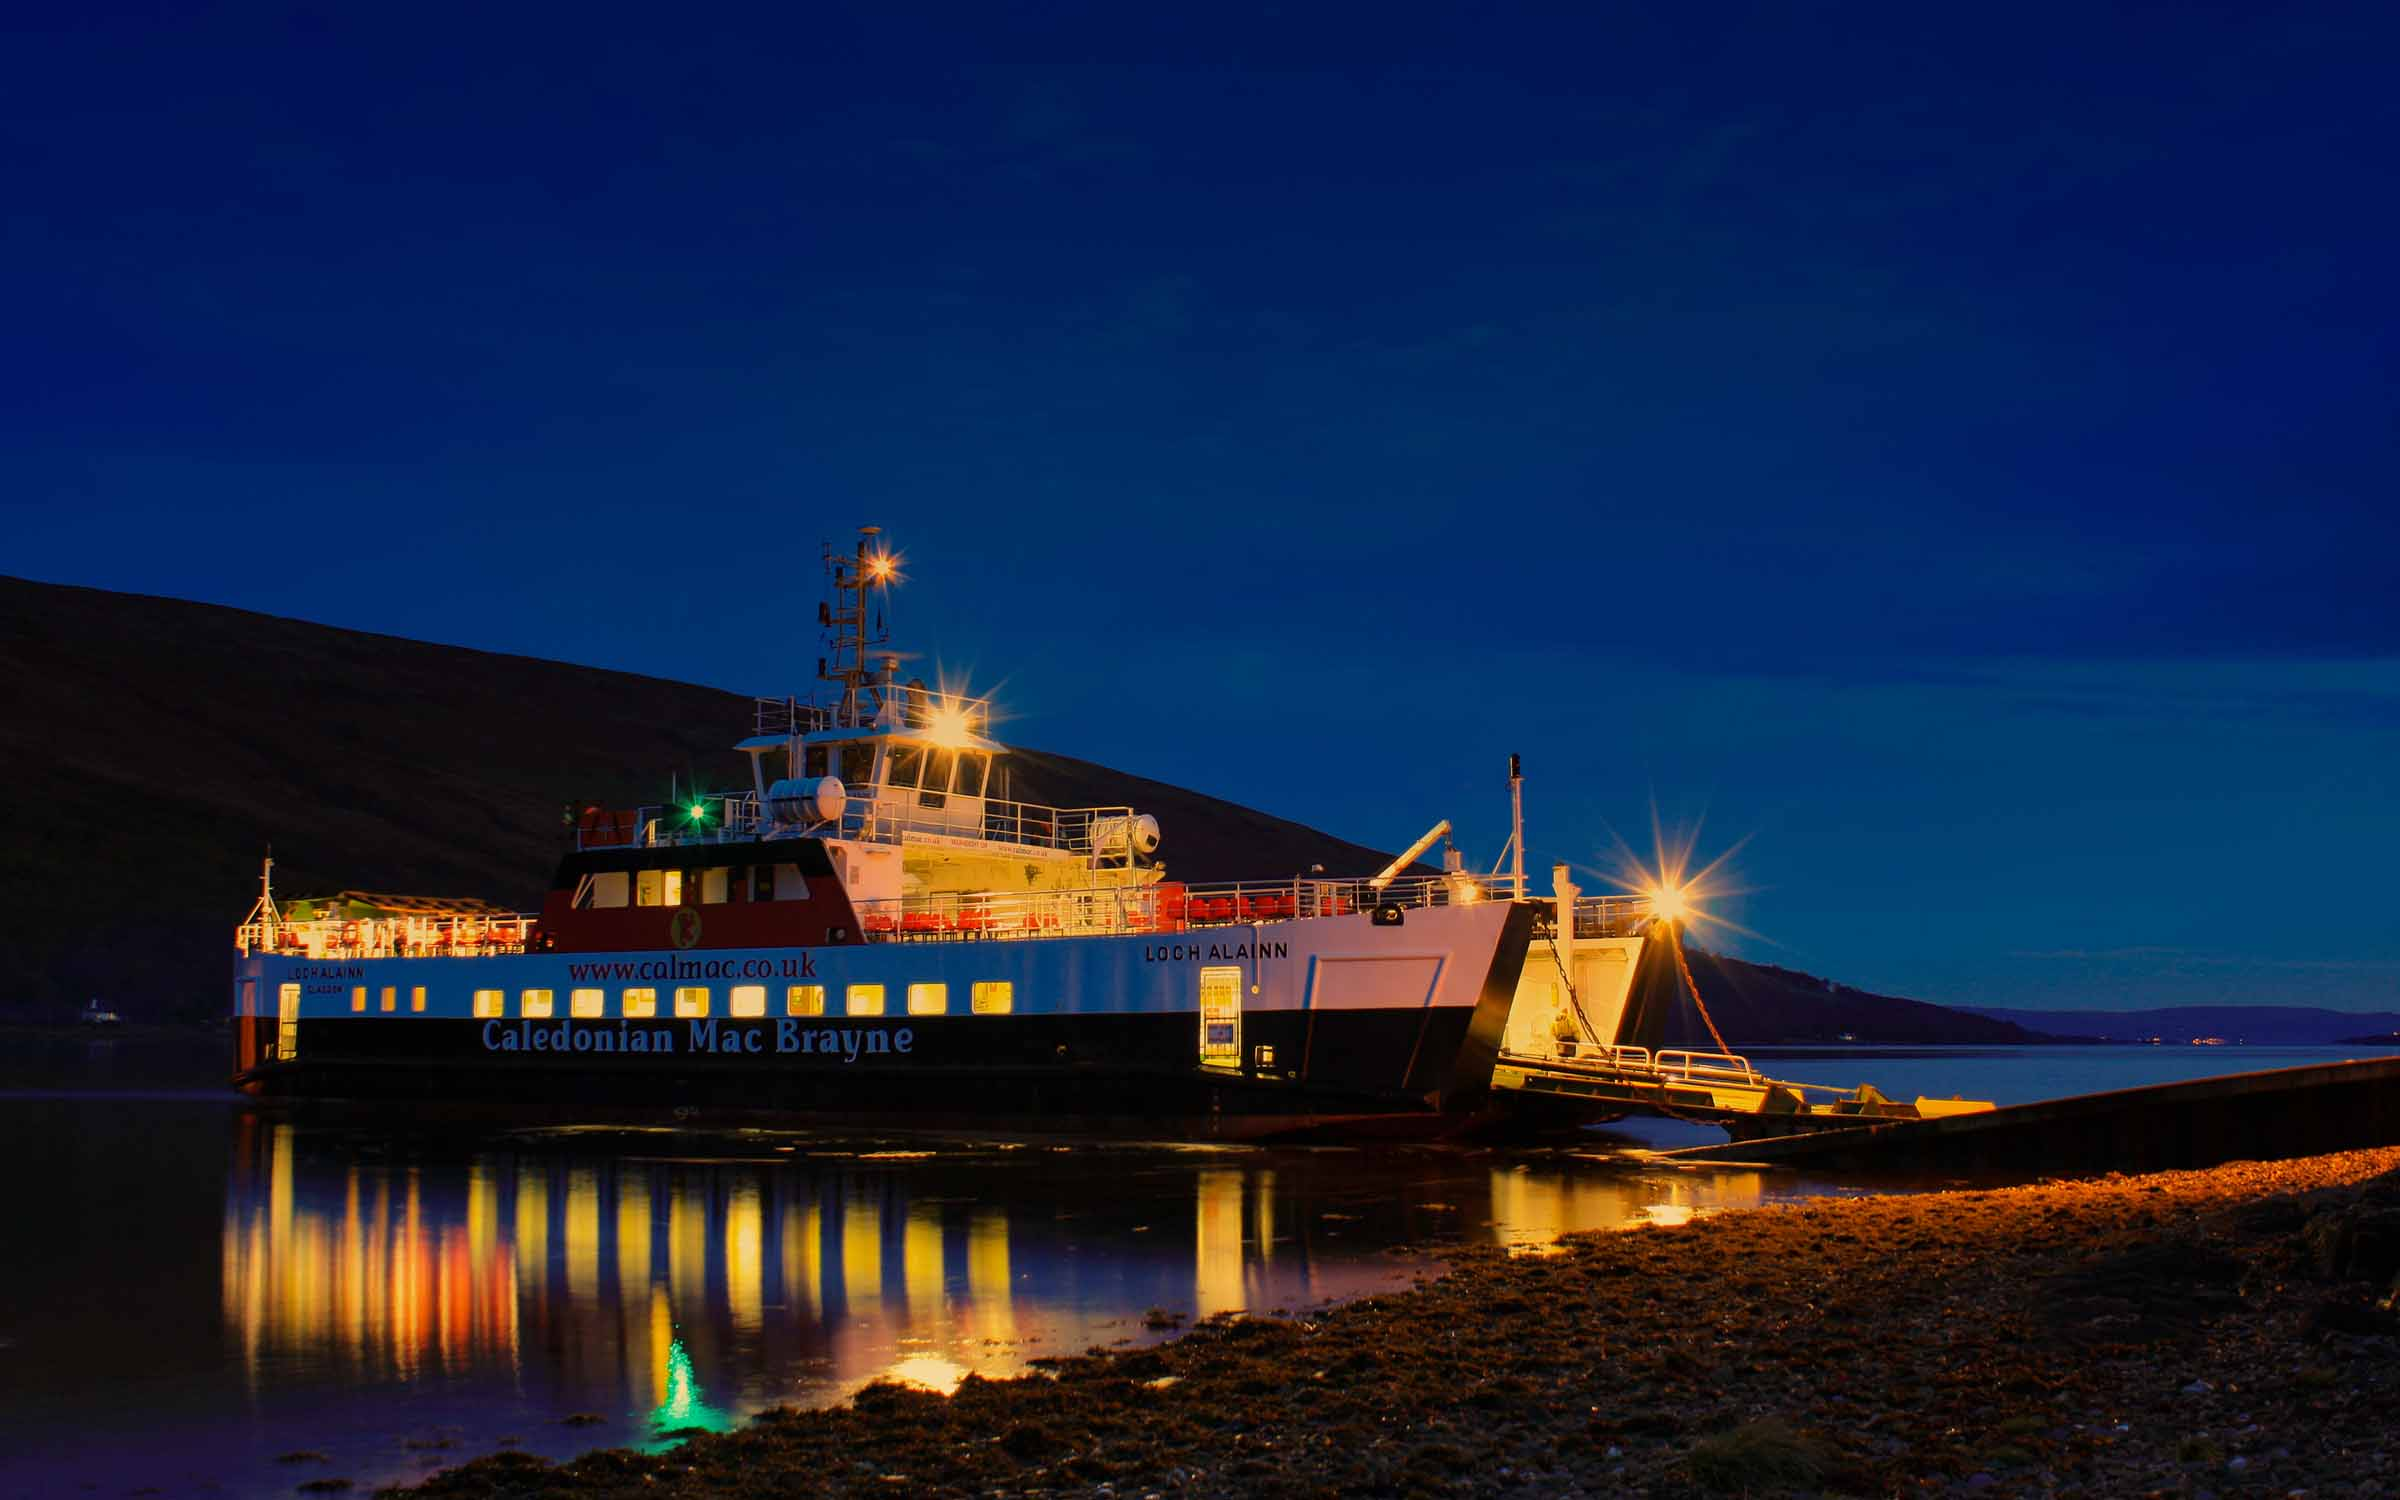 Loch Alainn at Rhubodach (Ships of CalMac)